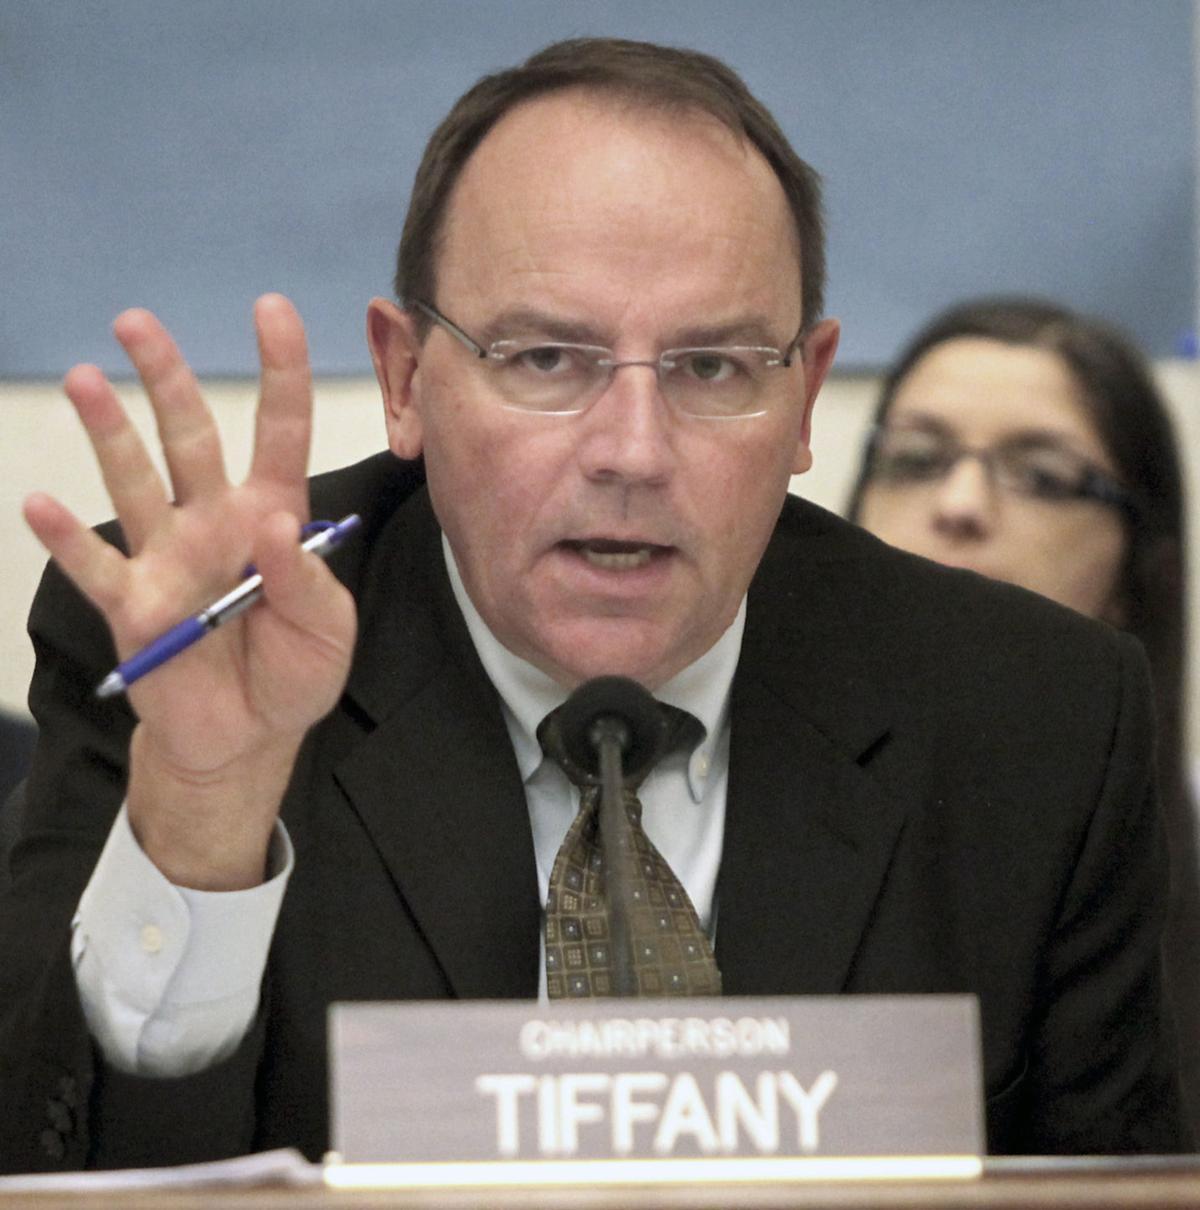 Tom Tiffany